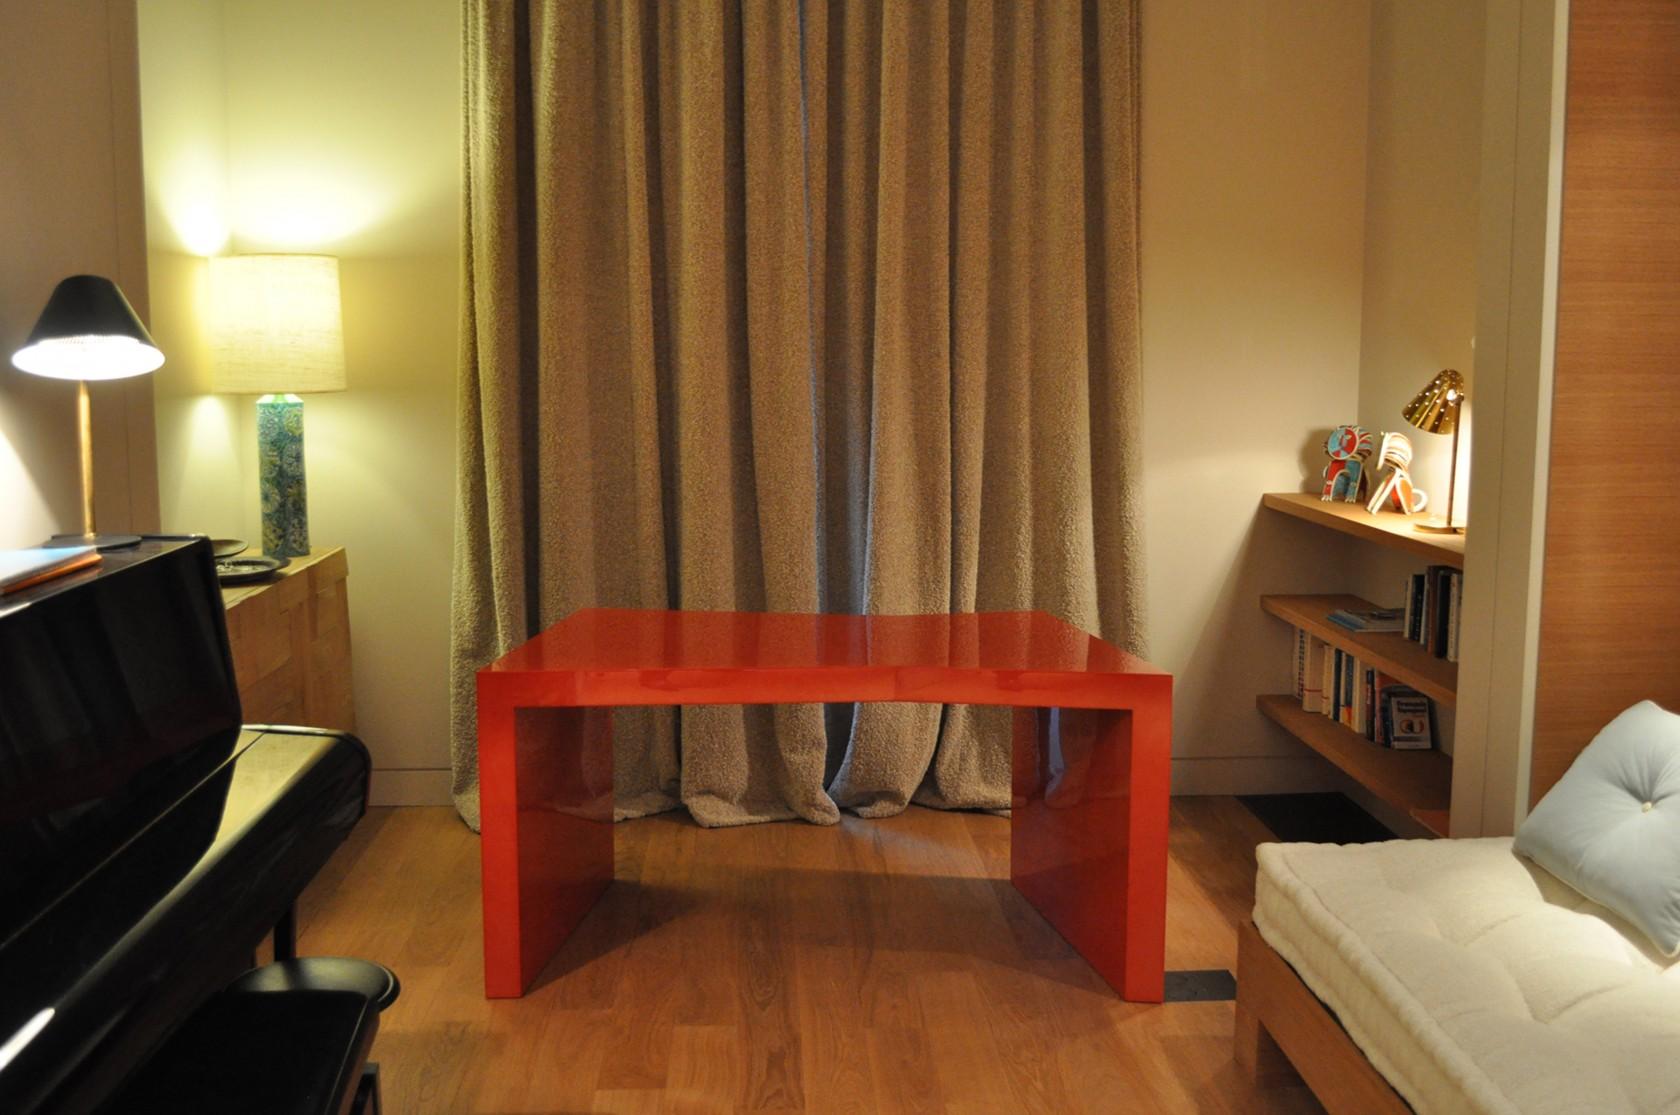 bureau laqu ludovic avenel b niste cr ateur paris. Black Bedroom Furniture Sets. Home Design Ideas